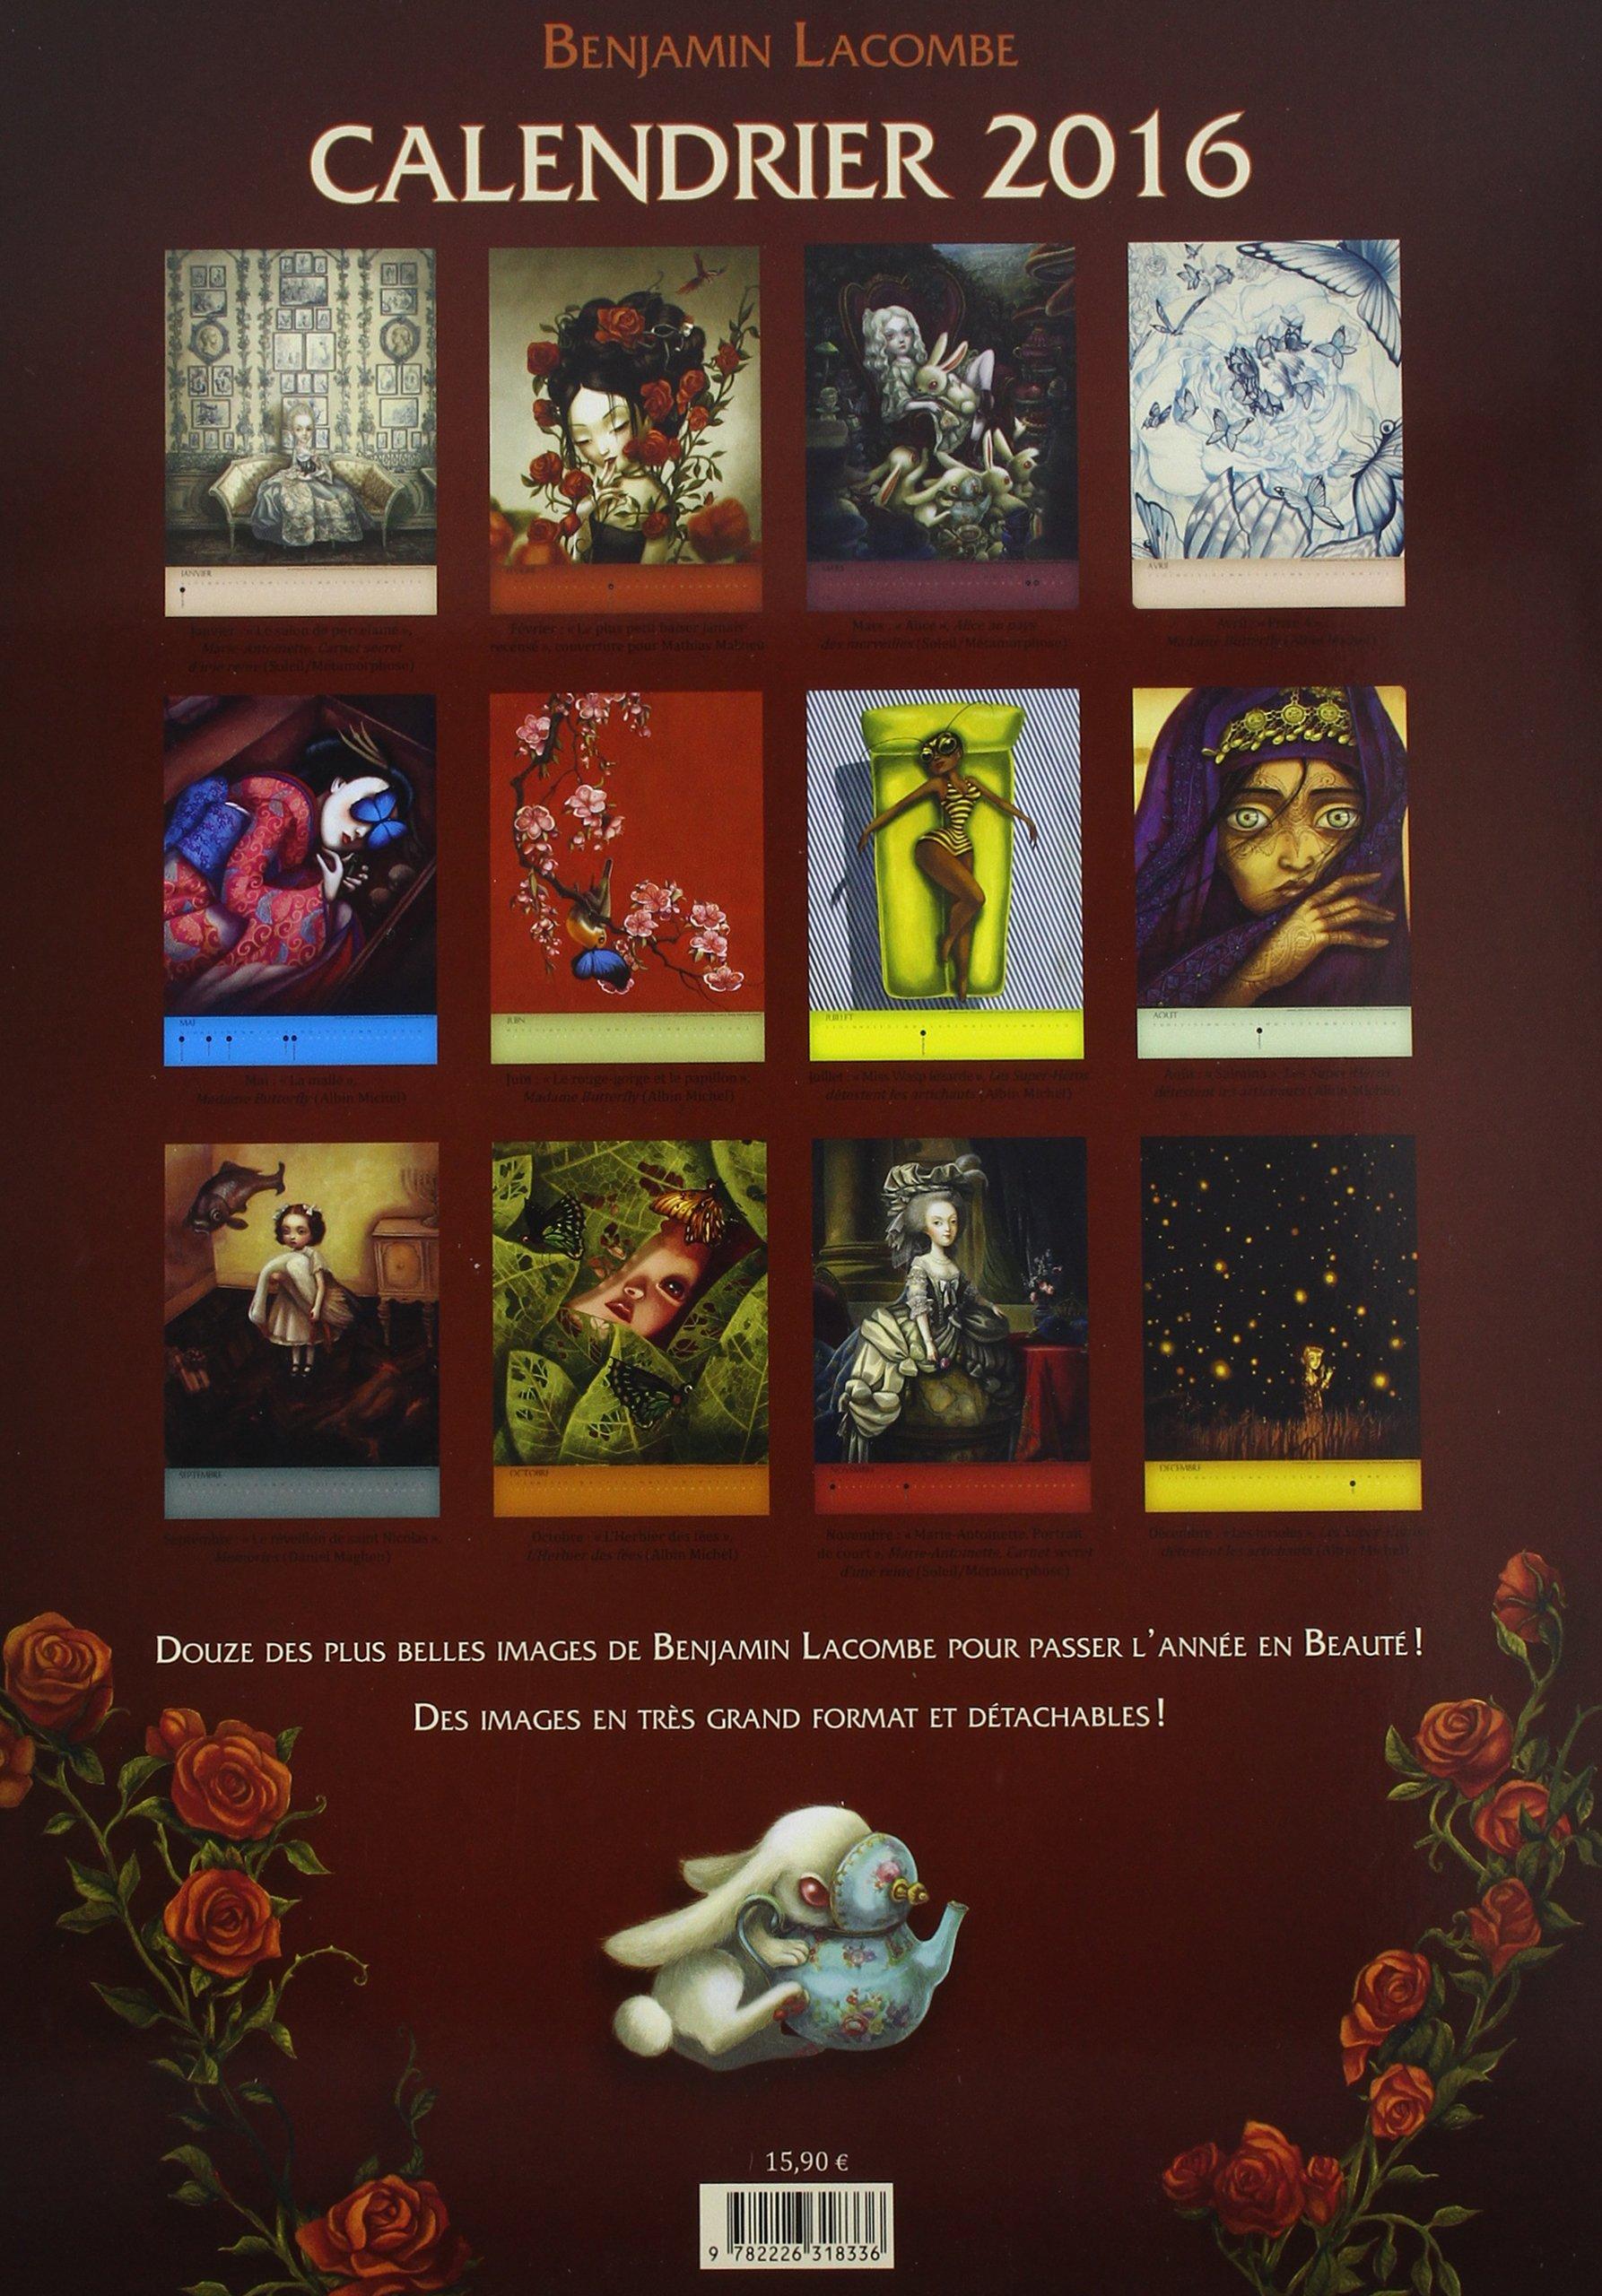 Le Calendrier 2016 (A.M. DIVERS): Amazon.es: Benjamin ...